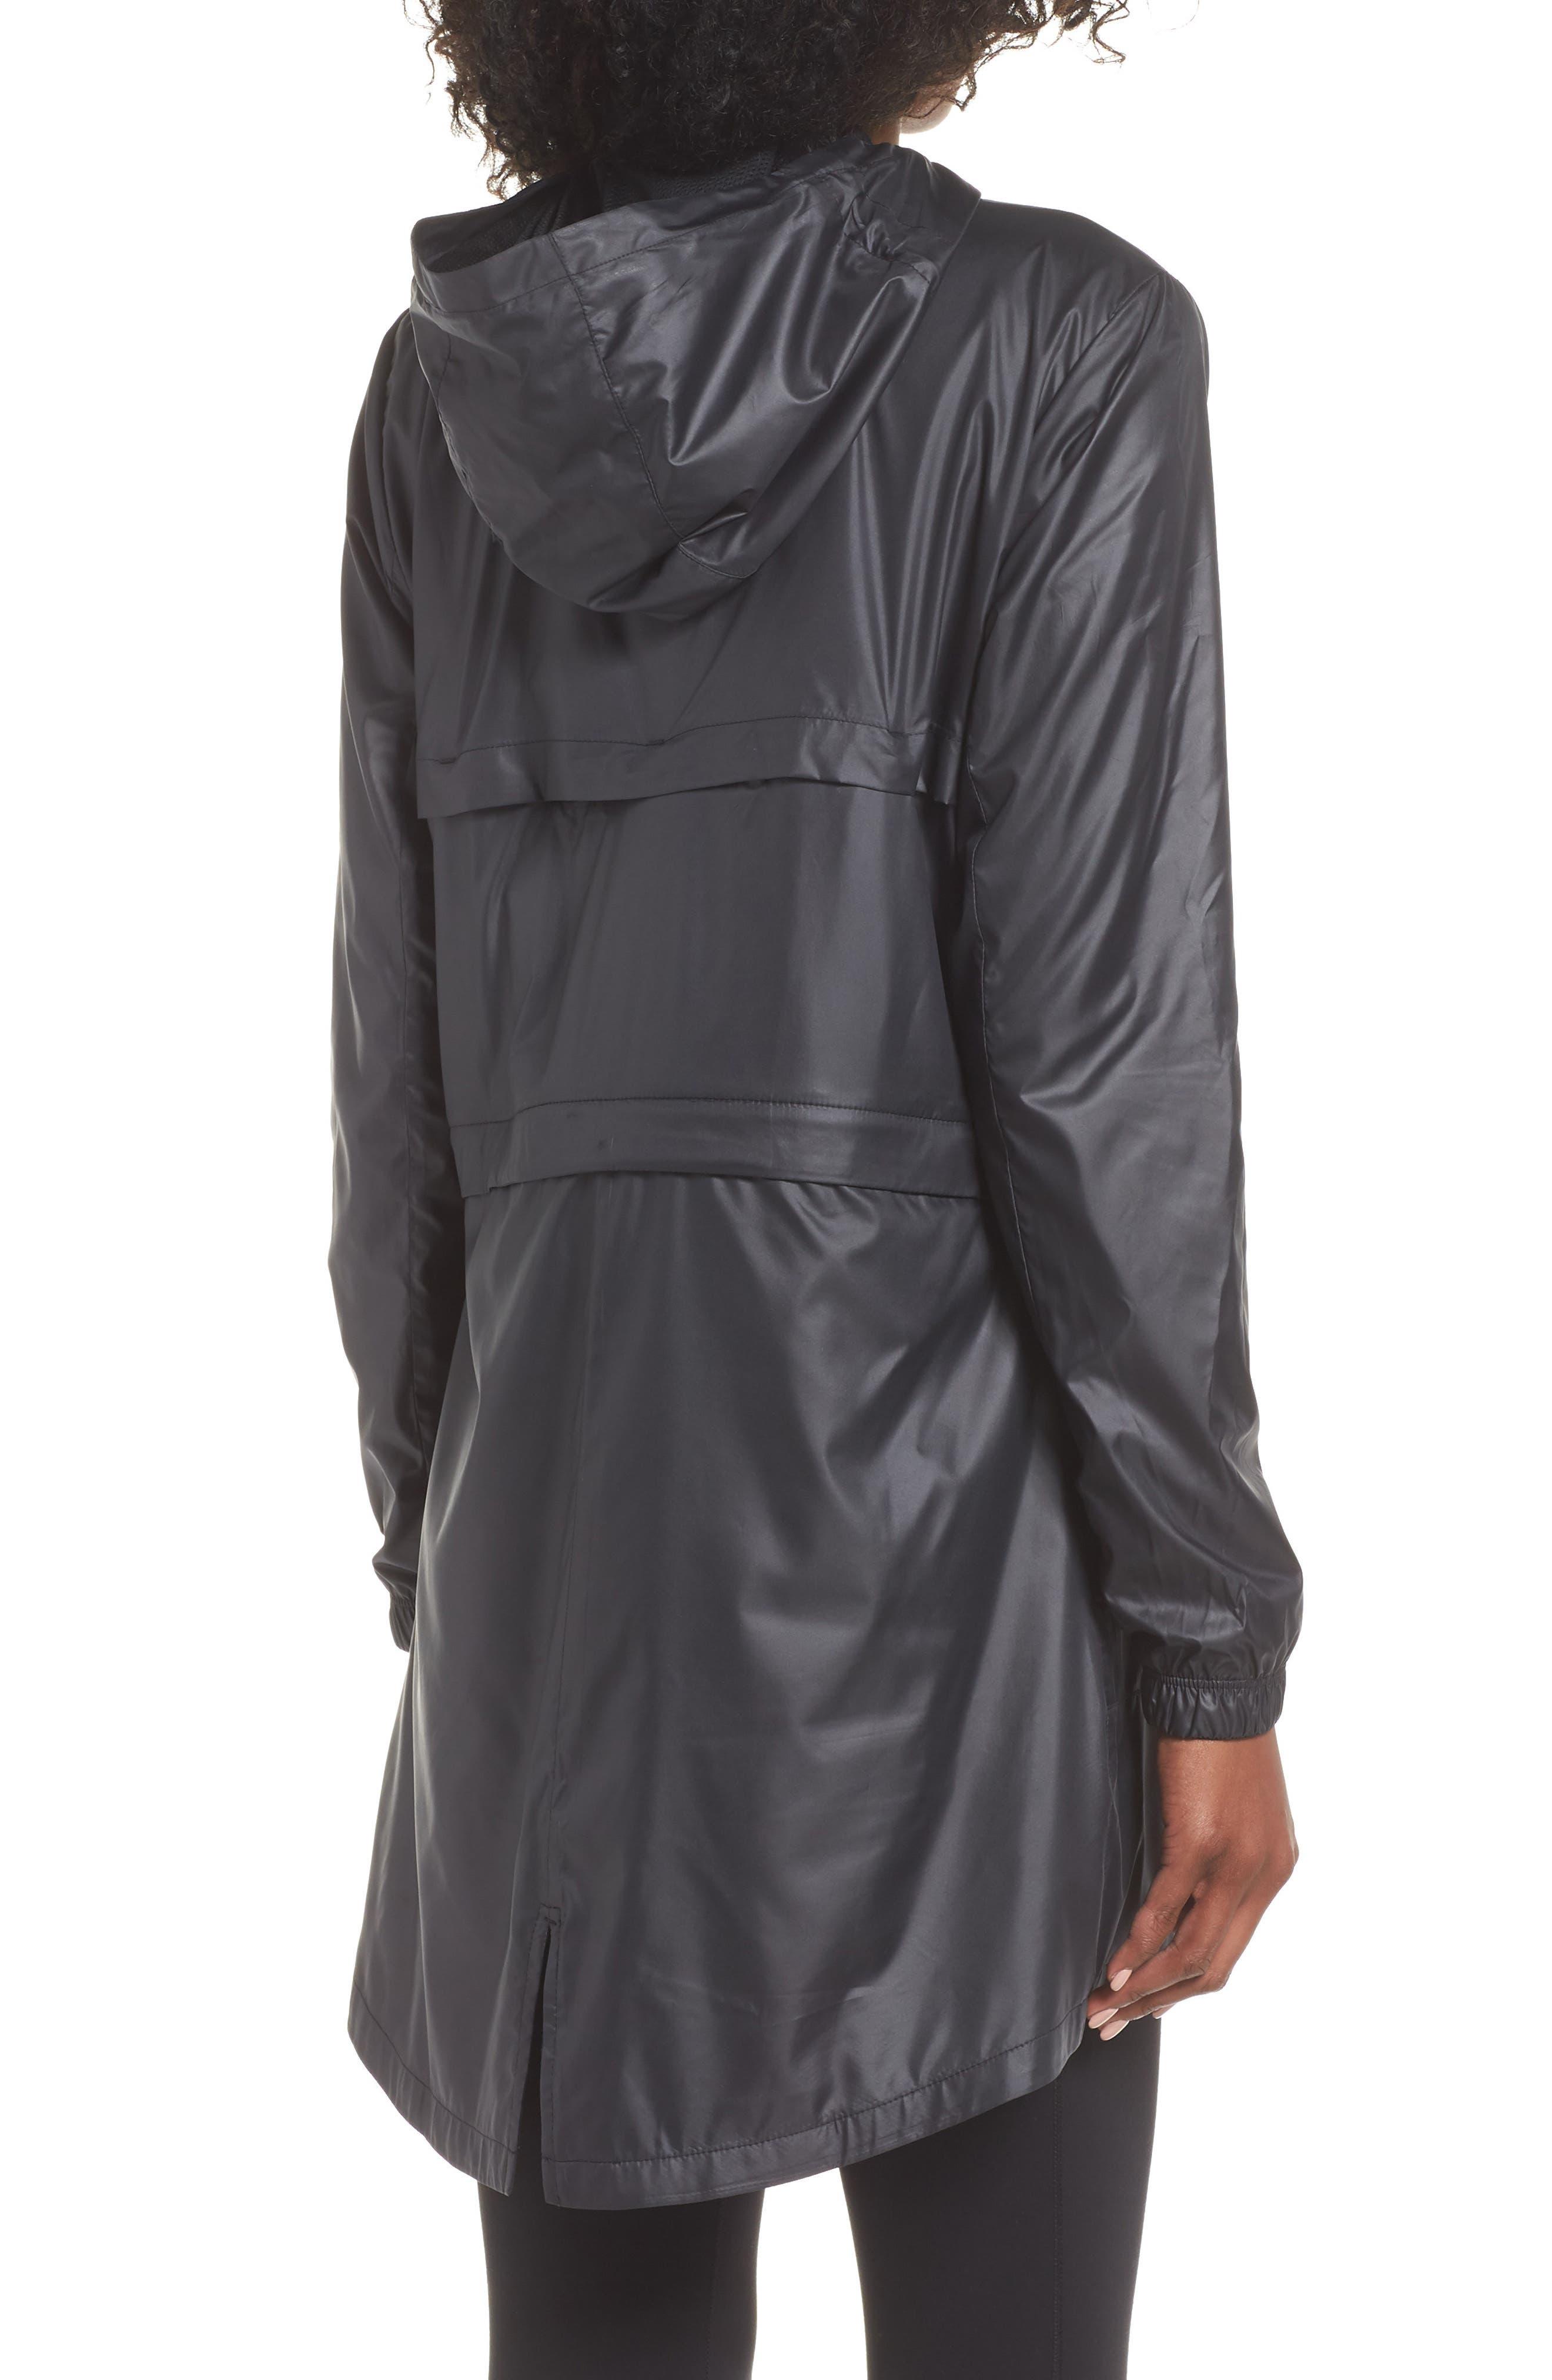 Women's Convertible Hooded Running Jacket,                             Alternate thumbnail 3, color,                             010